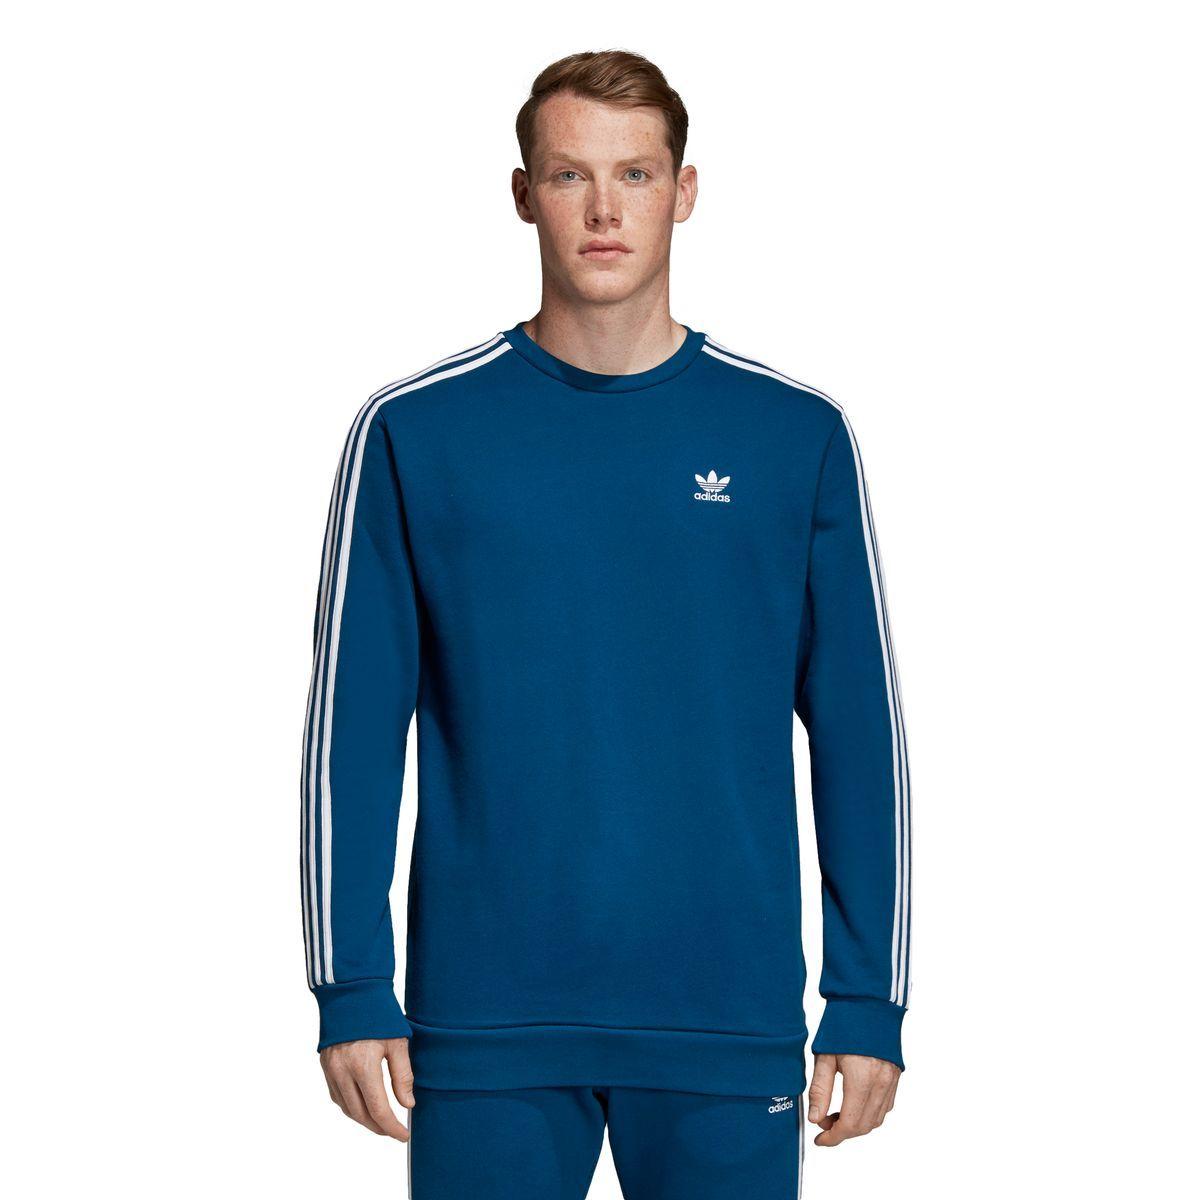 Sweatshirt Monogram Crewneck Taille : S | Sweat homme